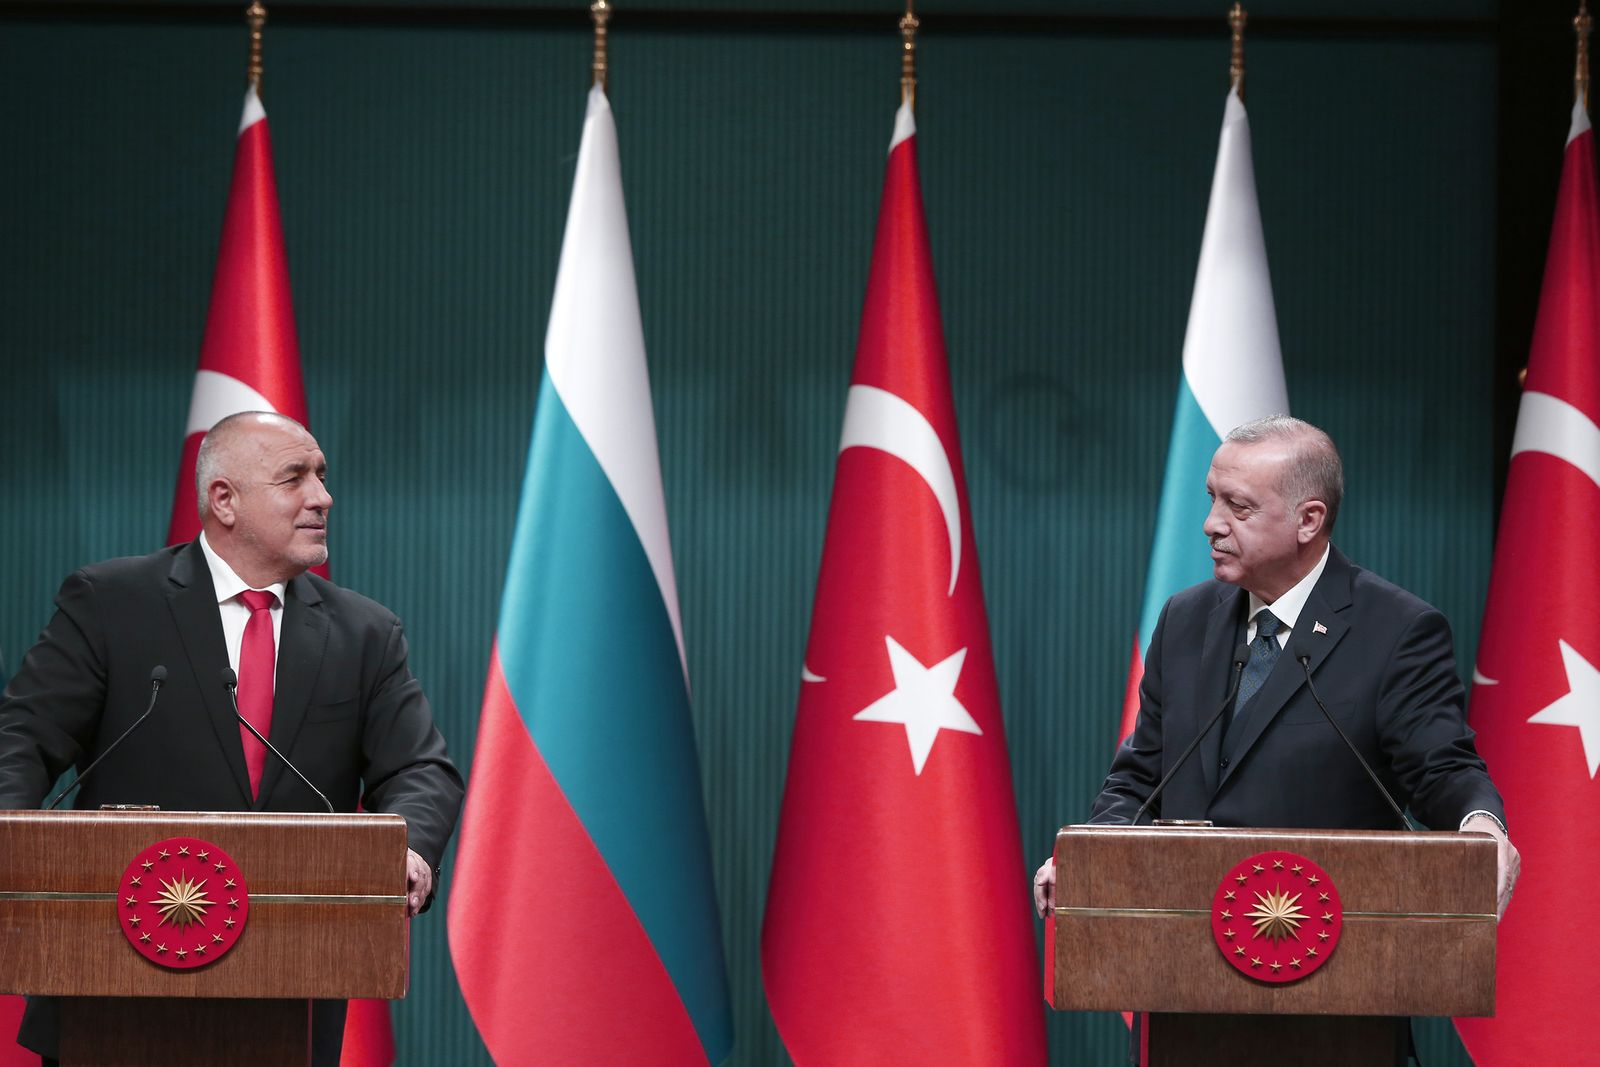 Recep Tayyip Erdogan - Boyko Borisov press conference